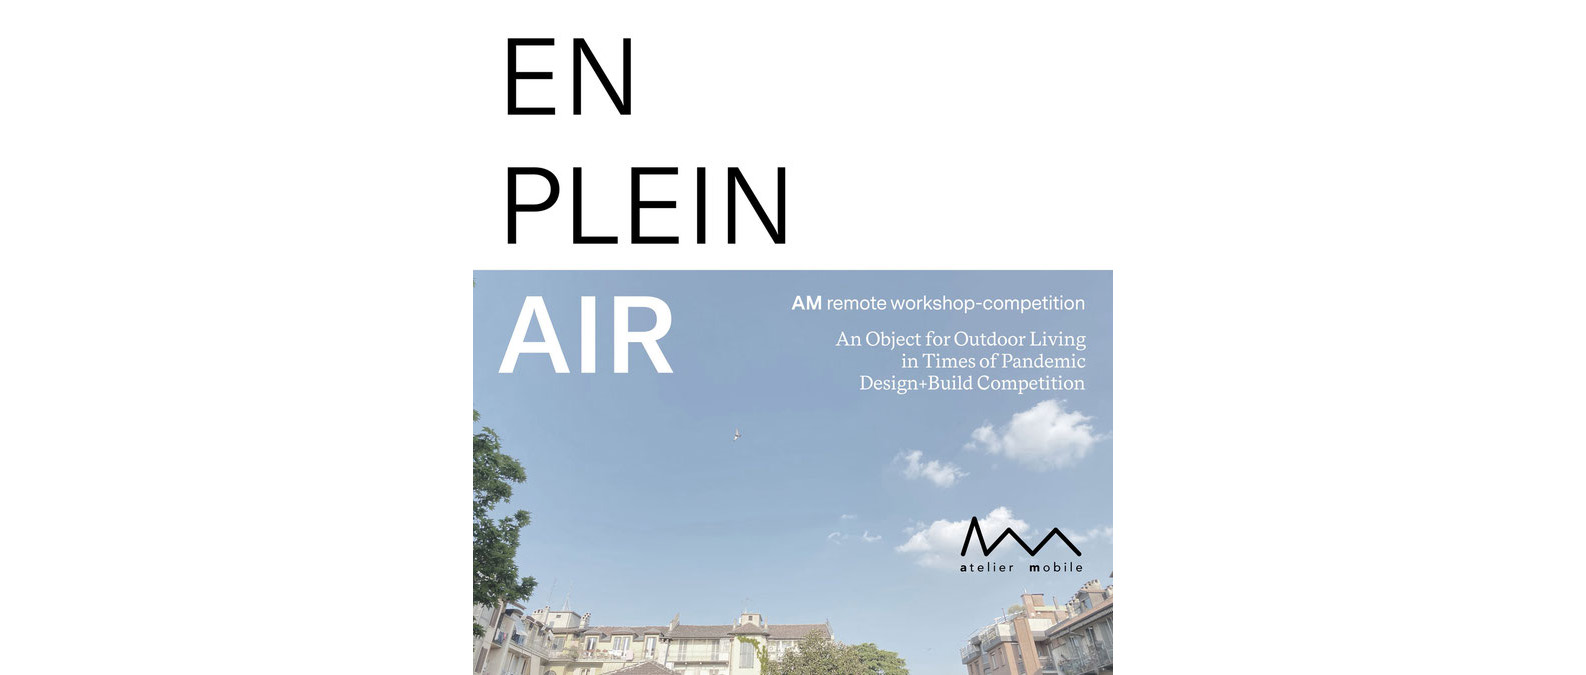 EN PLEIN AIR竞赛:疫情期间以户外生活为主题的设计建造竞赛